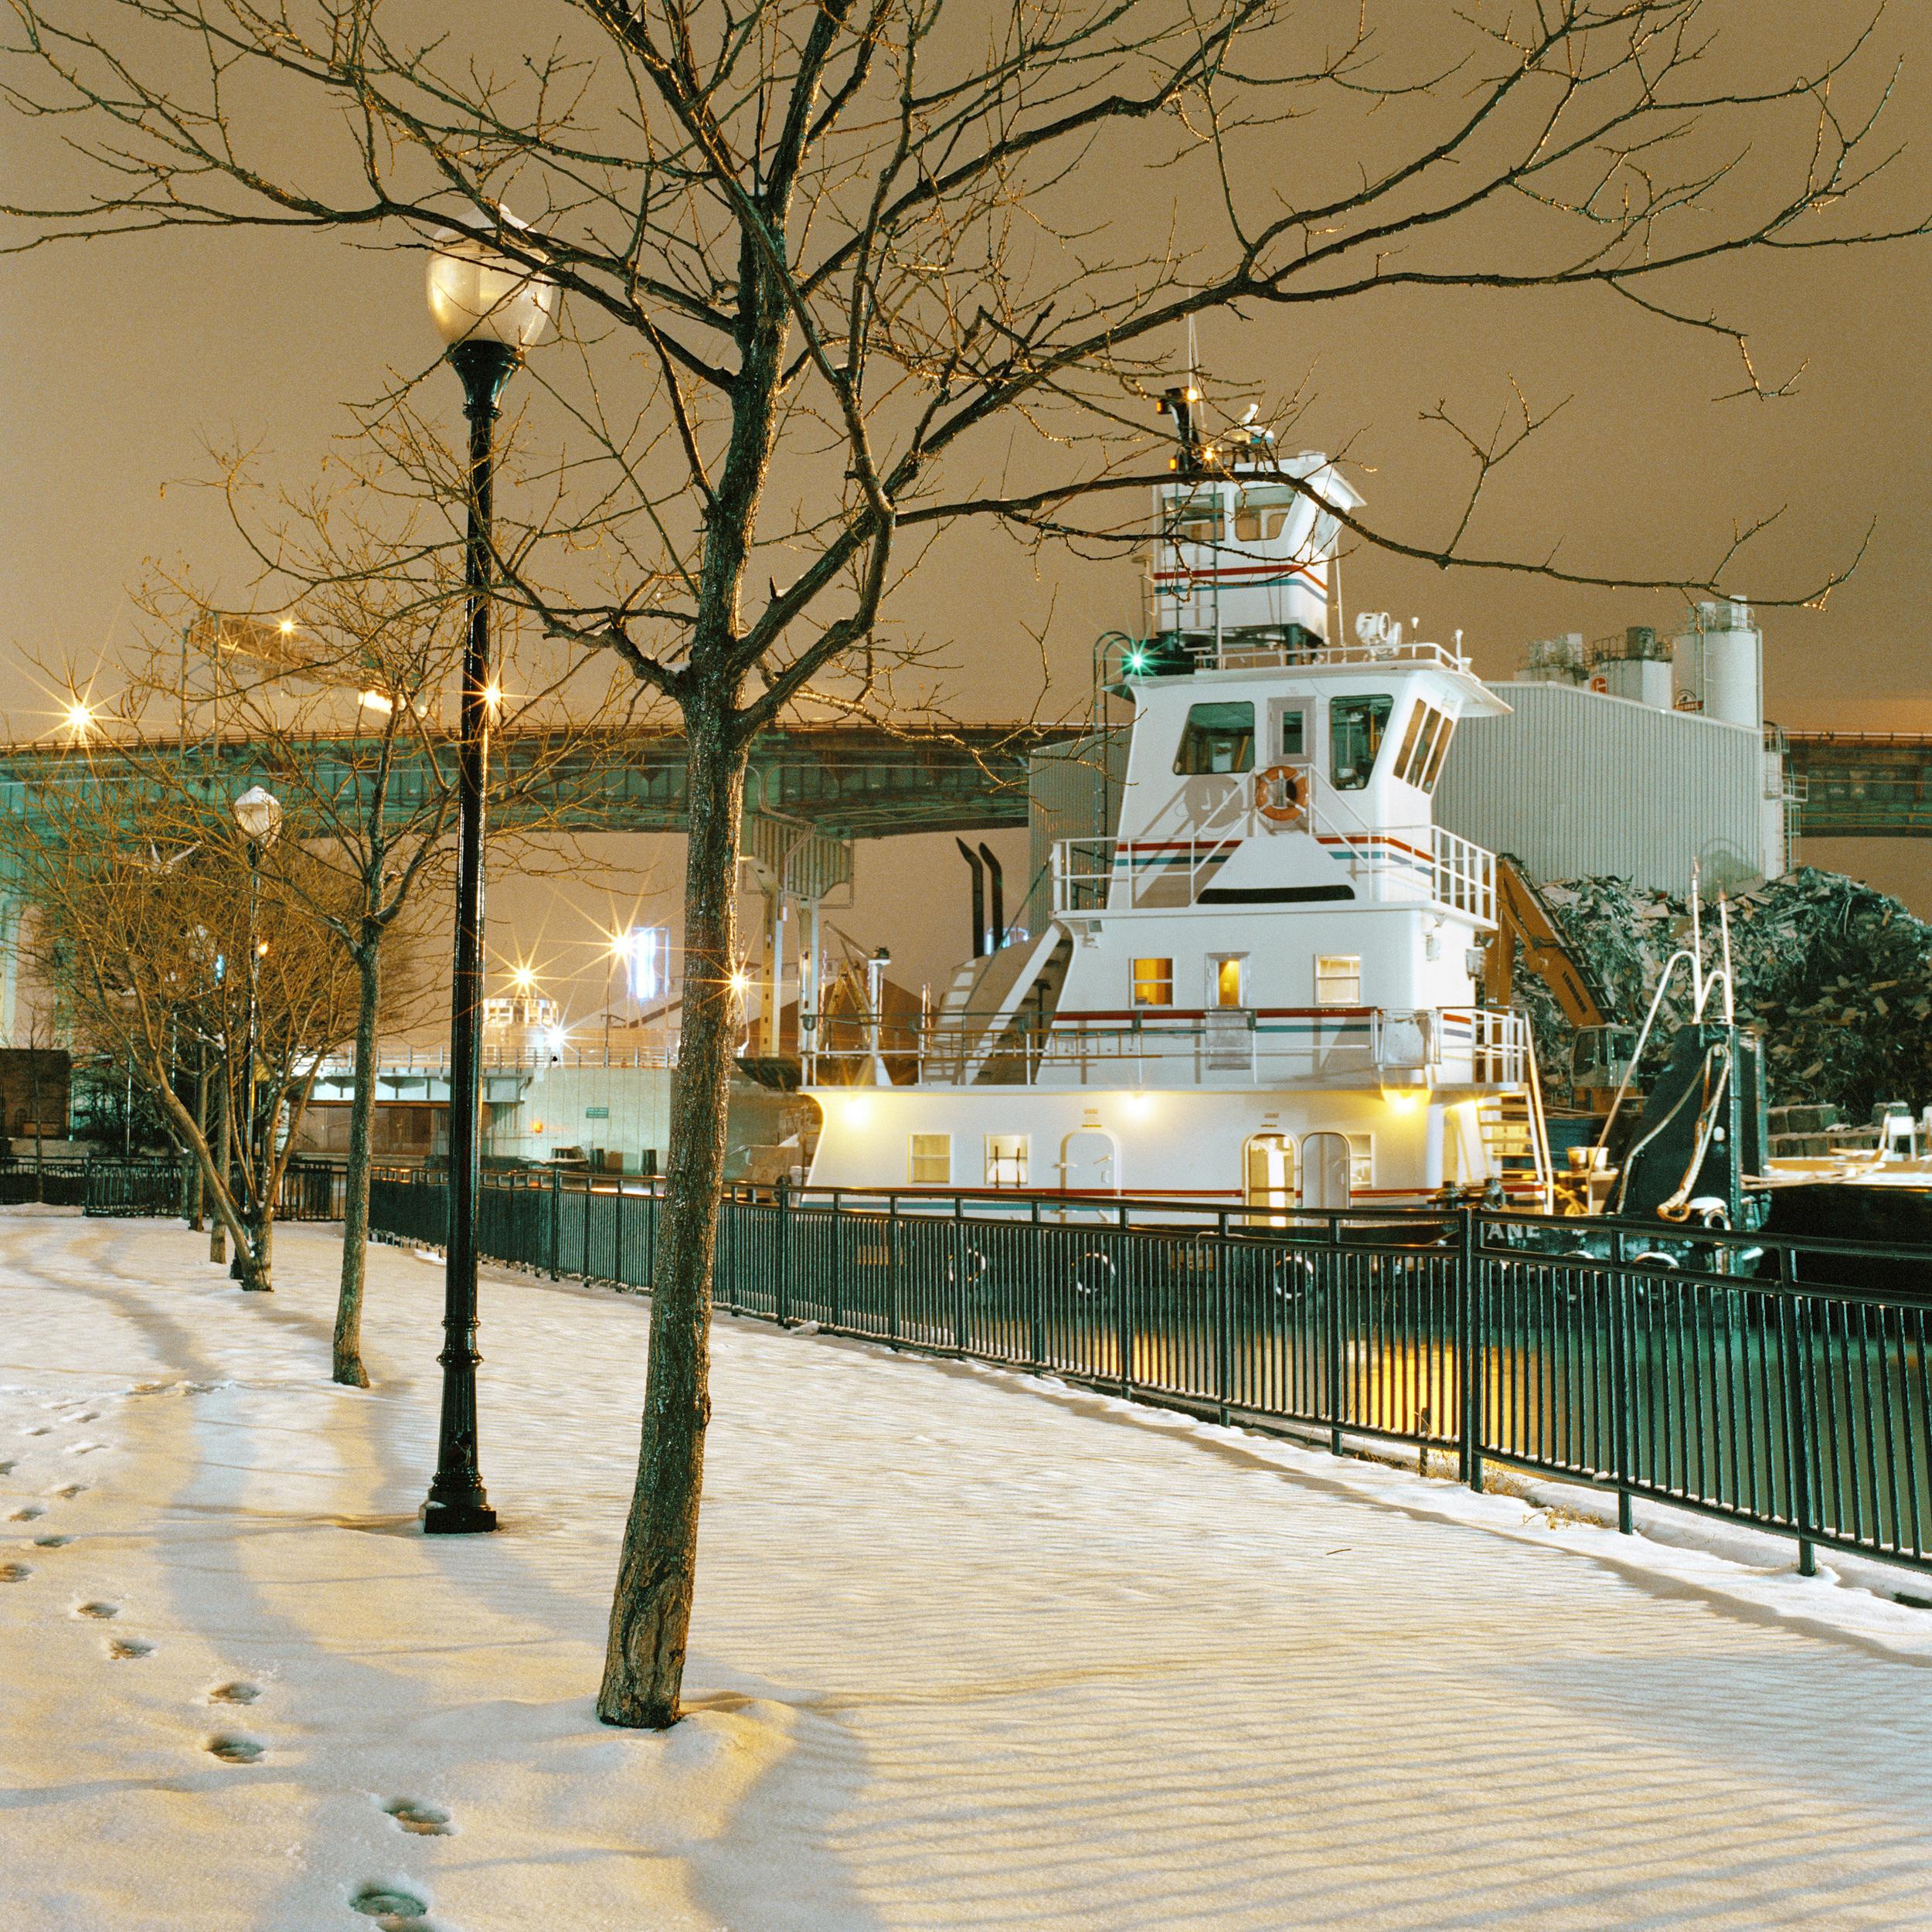 46_winter_tug.jpg